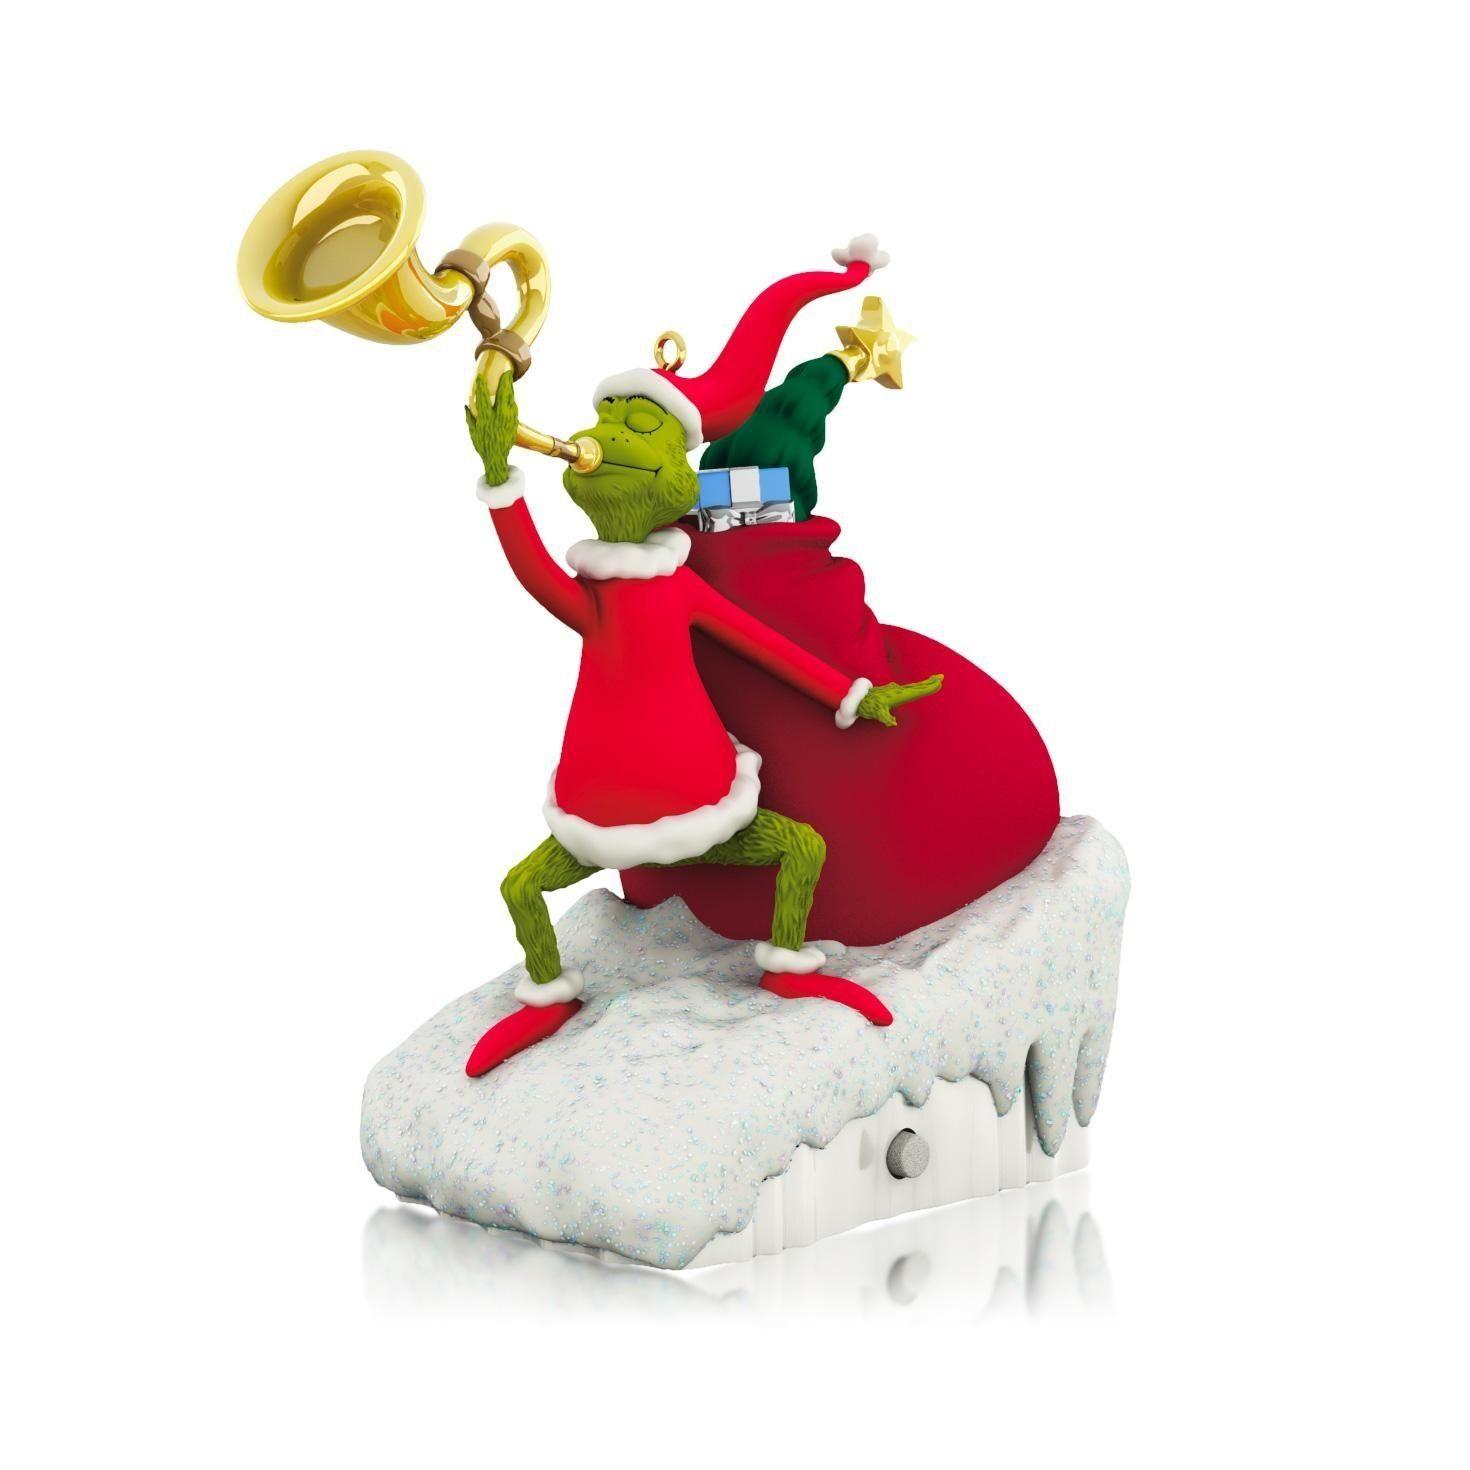 Christmas Ornaments: DIY DR. SEUSS FURNITURE